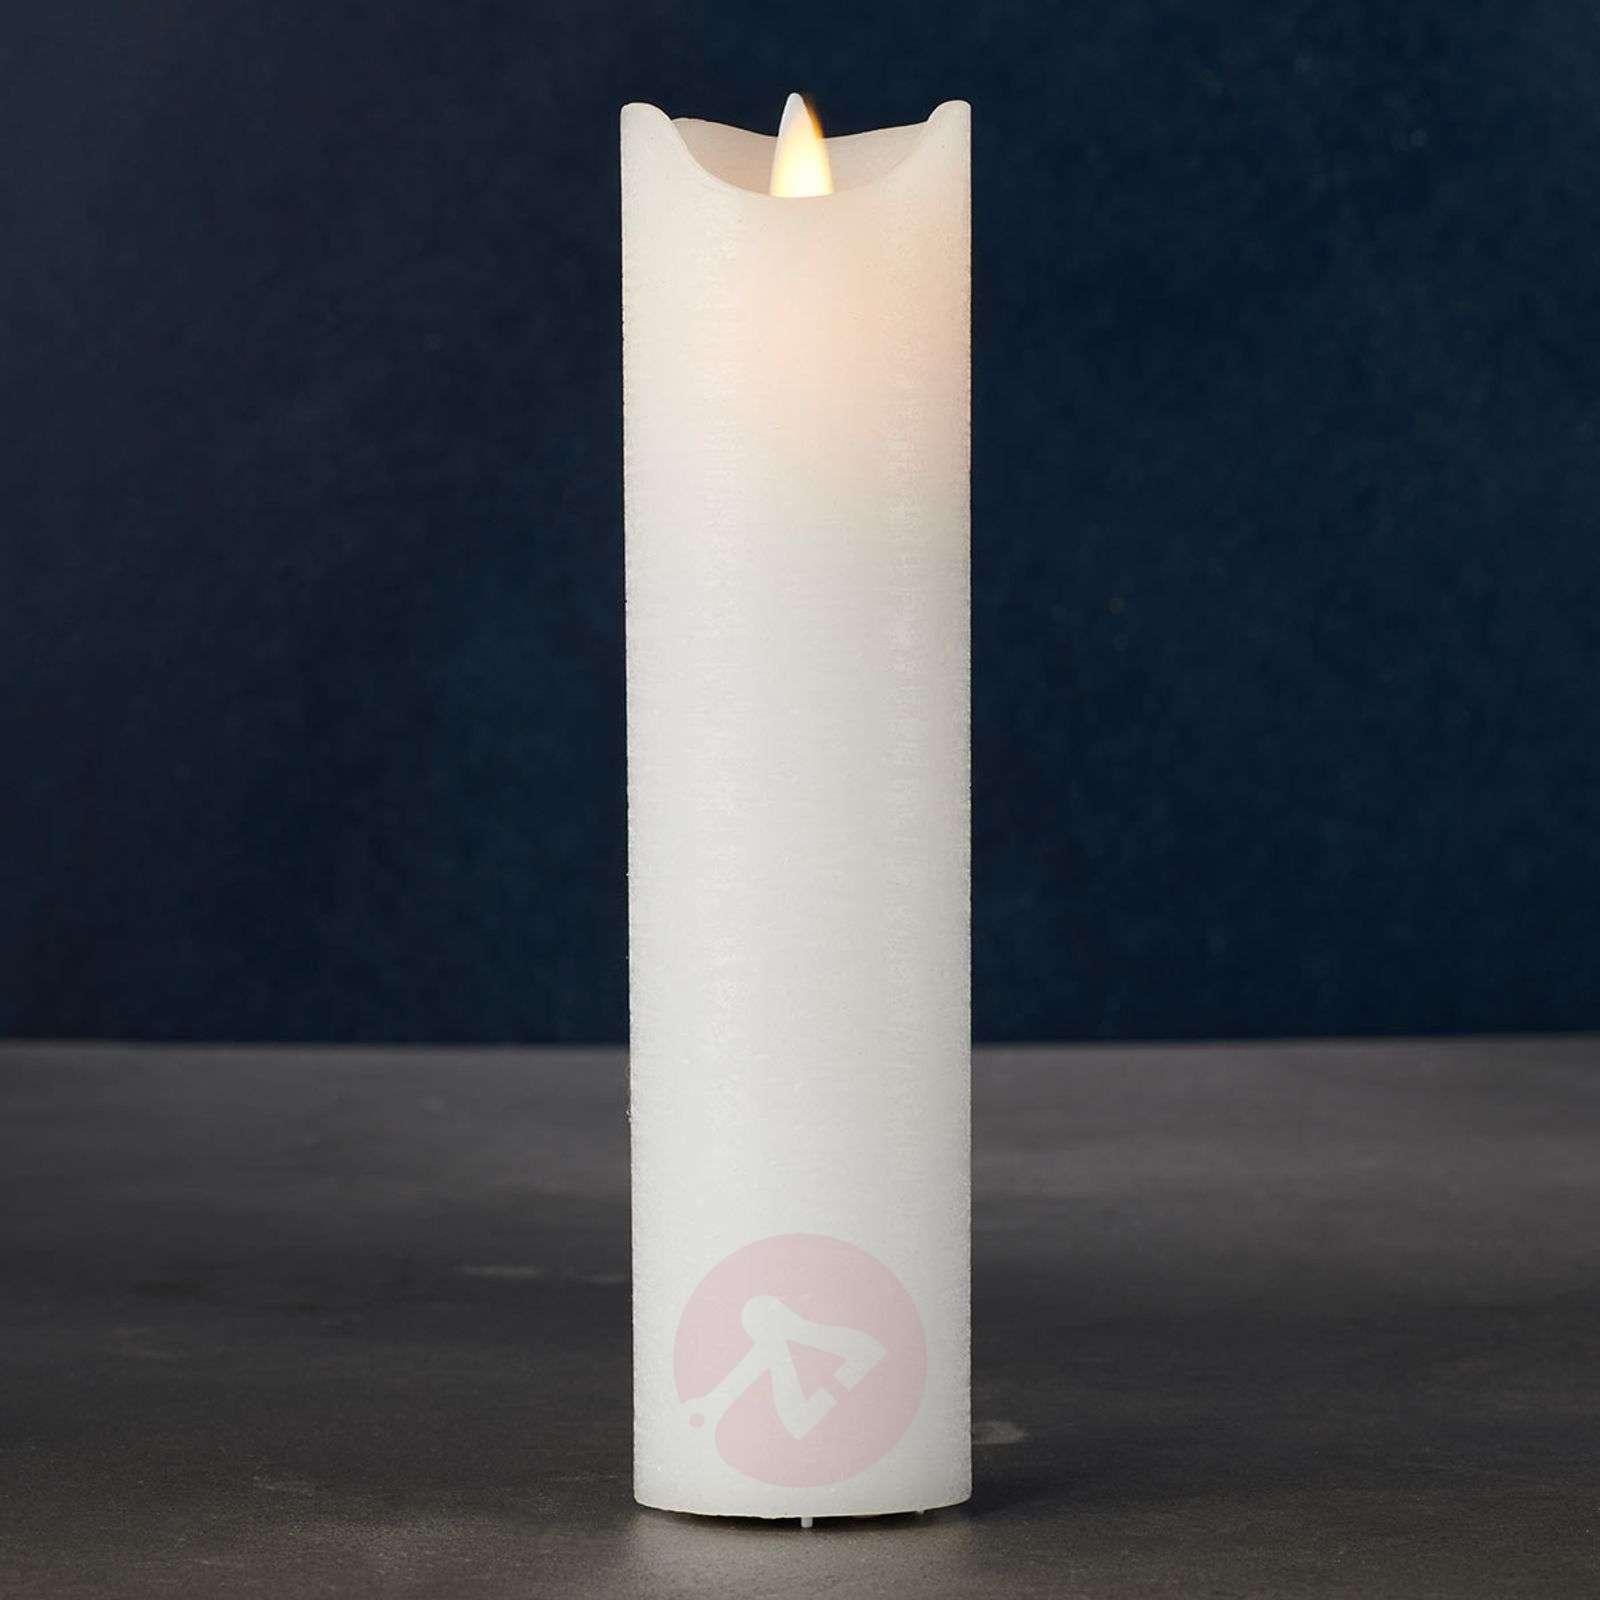 Lepattava LED-kynttilä Sara Exclusive Ø 5 cm-8577258X-02